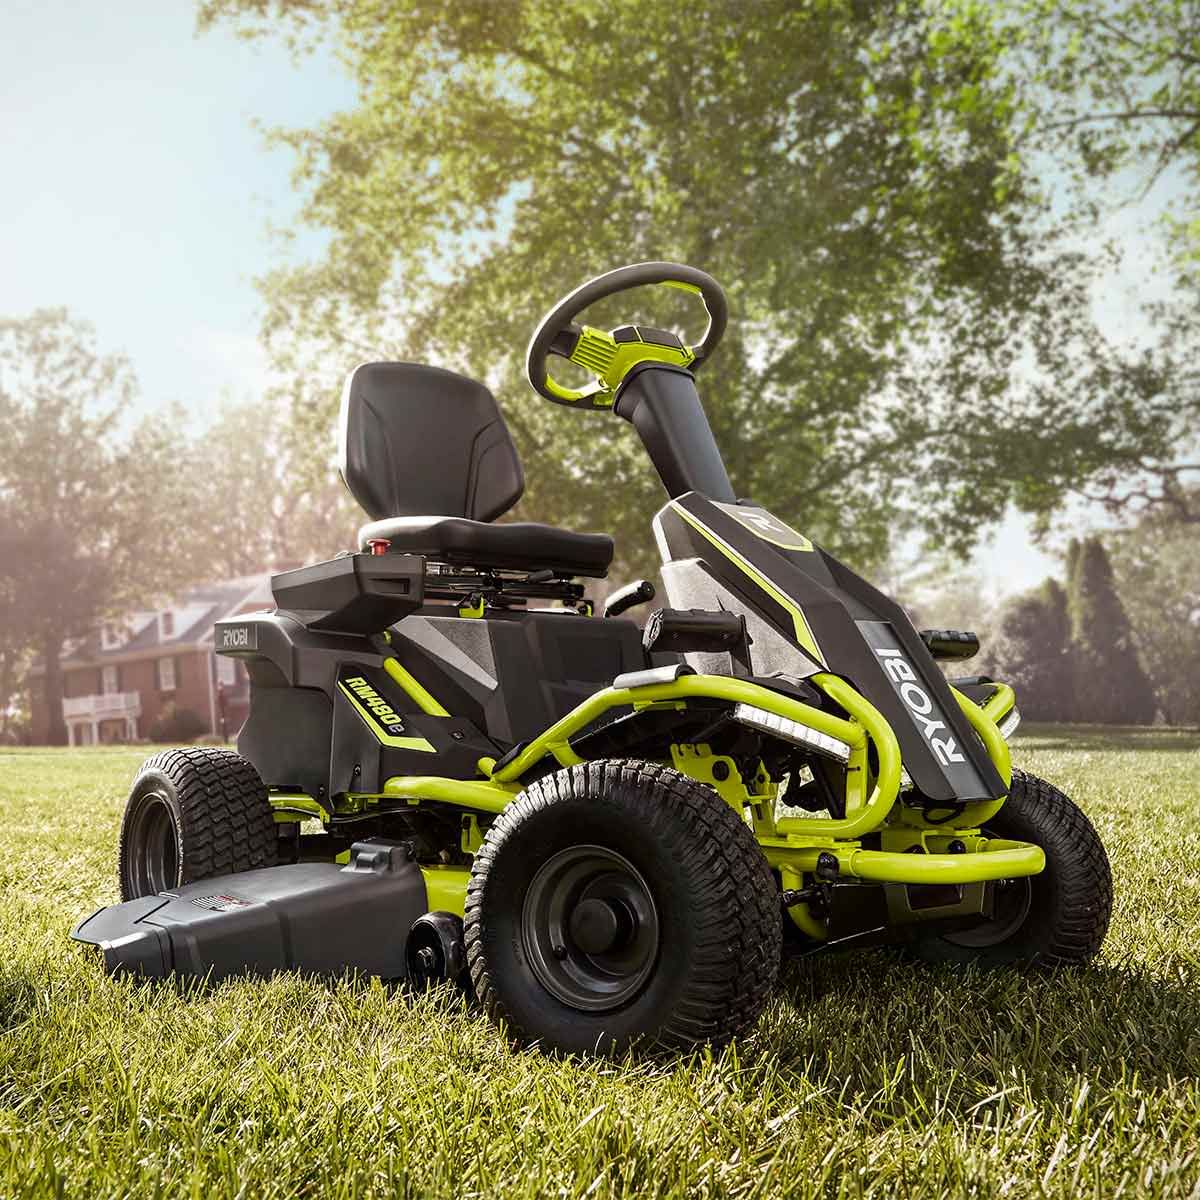 Ryobi Rm480e Riding Lawnmower Electric Riding Lawn Mower Riding Lawnmower Riding Lawn Mowers